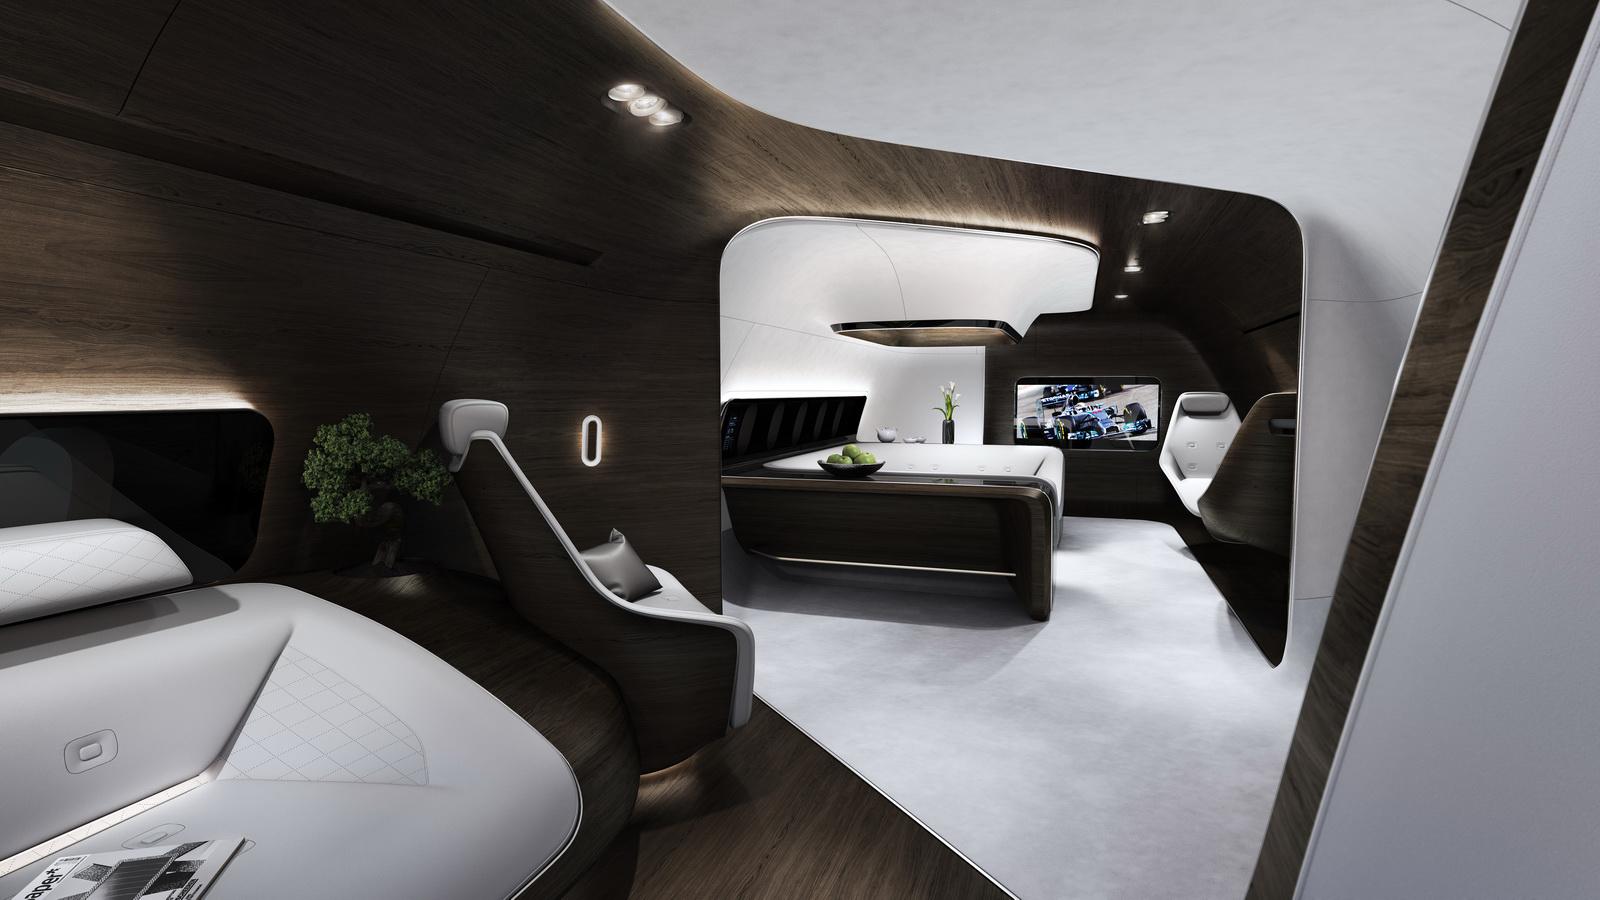 Mercedes-Lufthansa-VIP-aircraft-cabins-9